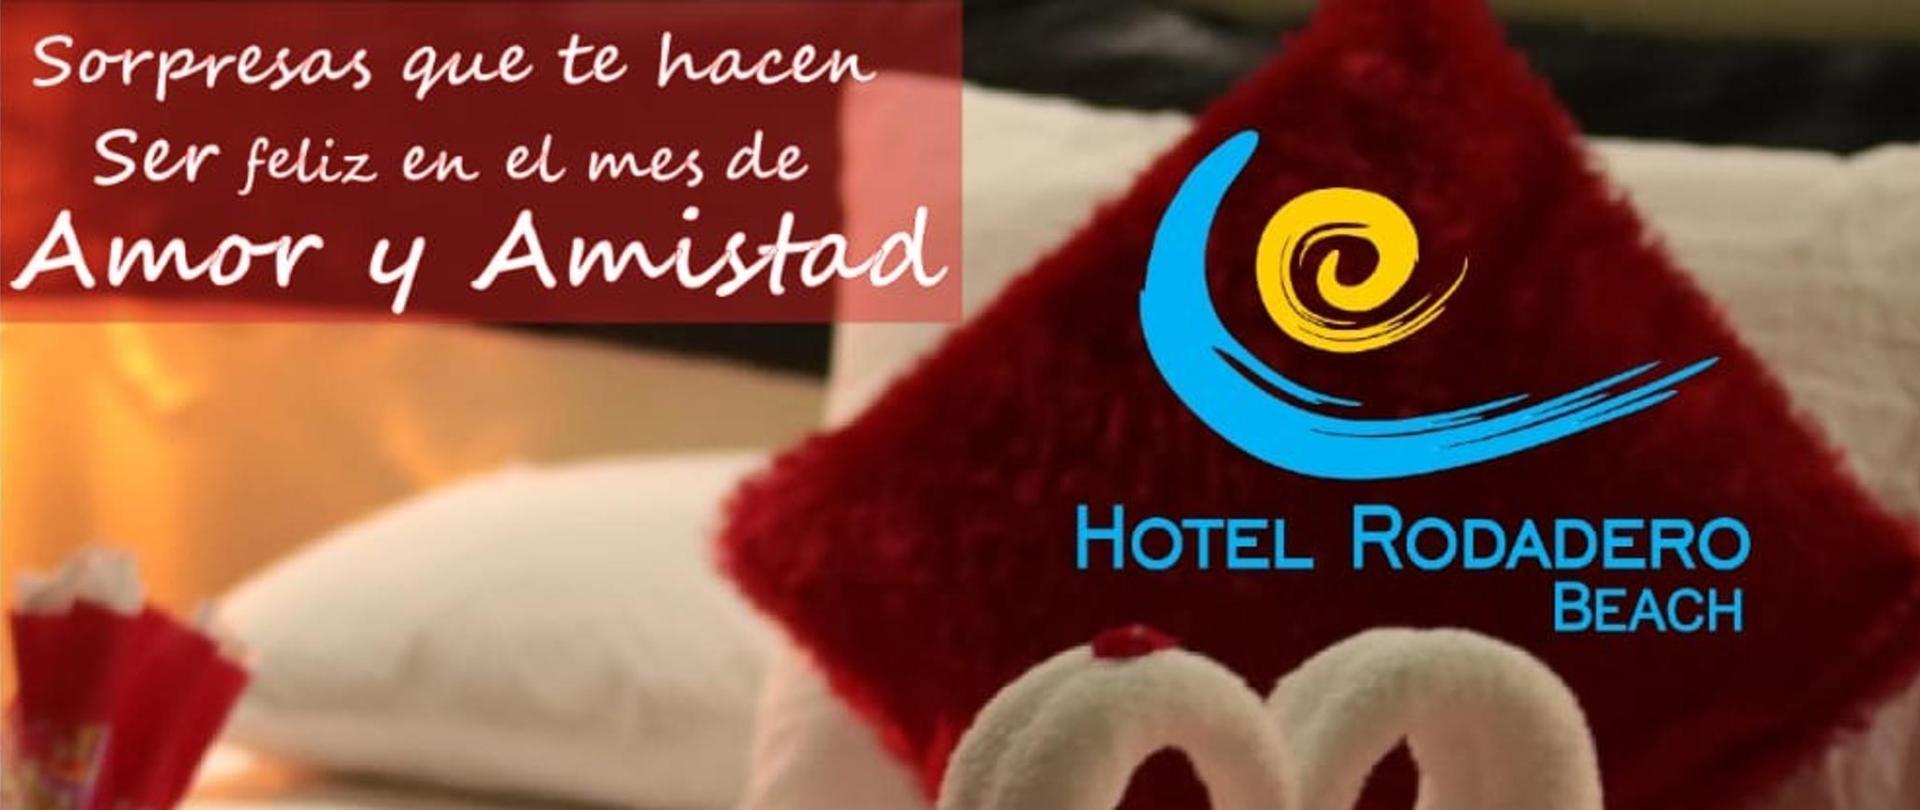 amor y amistad hotel rodadero beach santa marta playa arena sol.jpeg